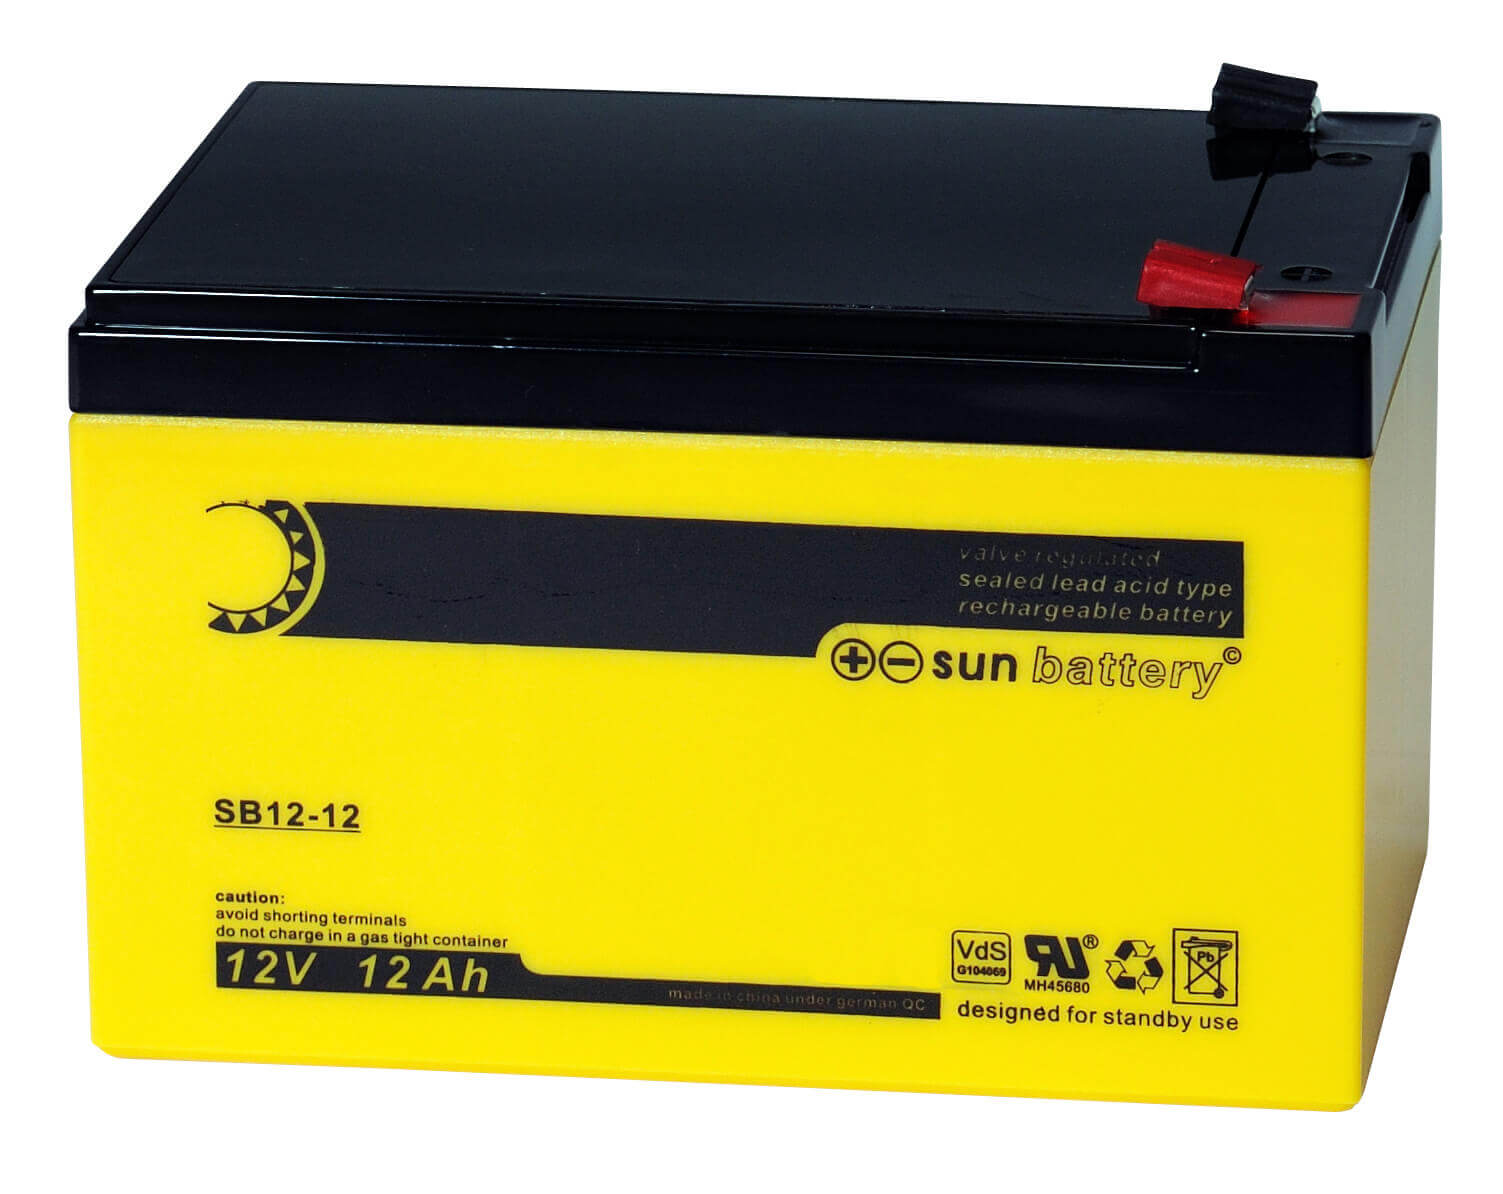 Sun Battery SB12-12 12V 12Ah Bleiakku Faston 250 Anschluss